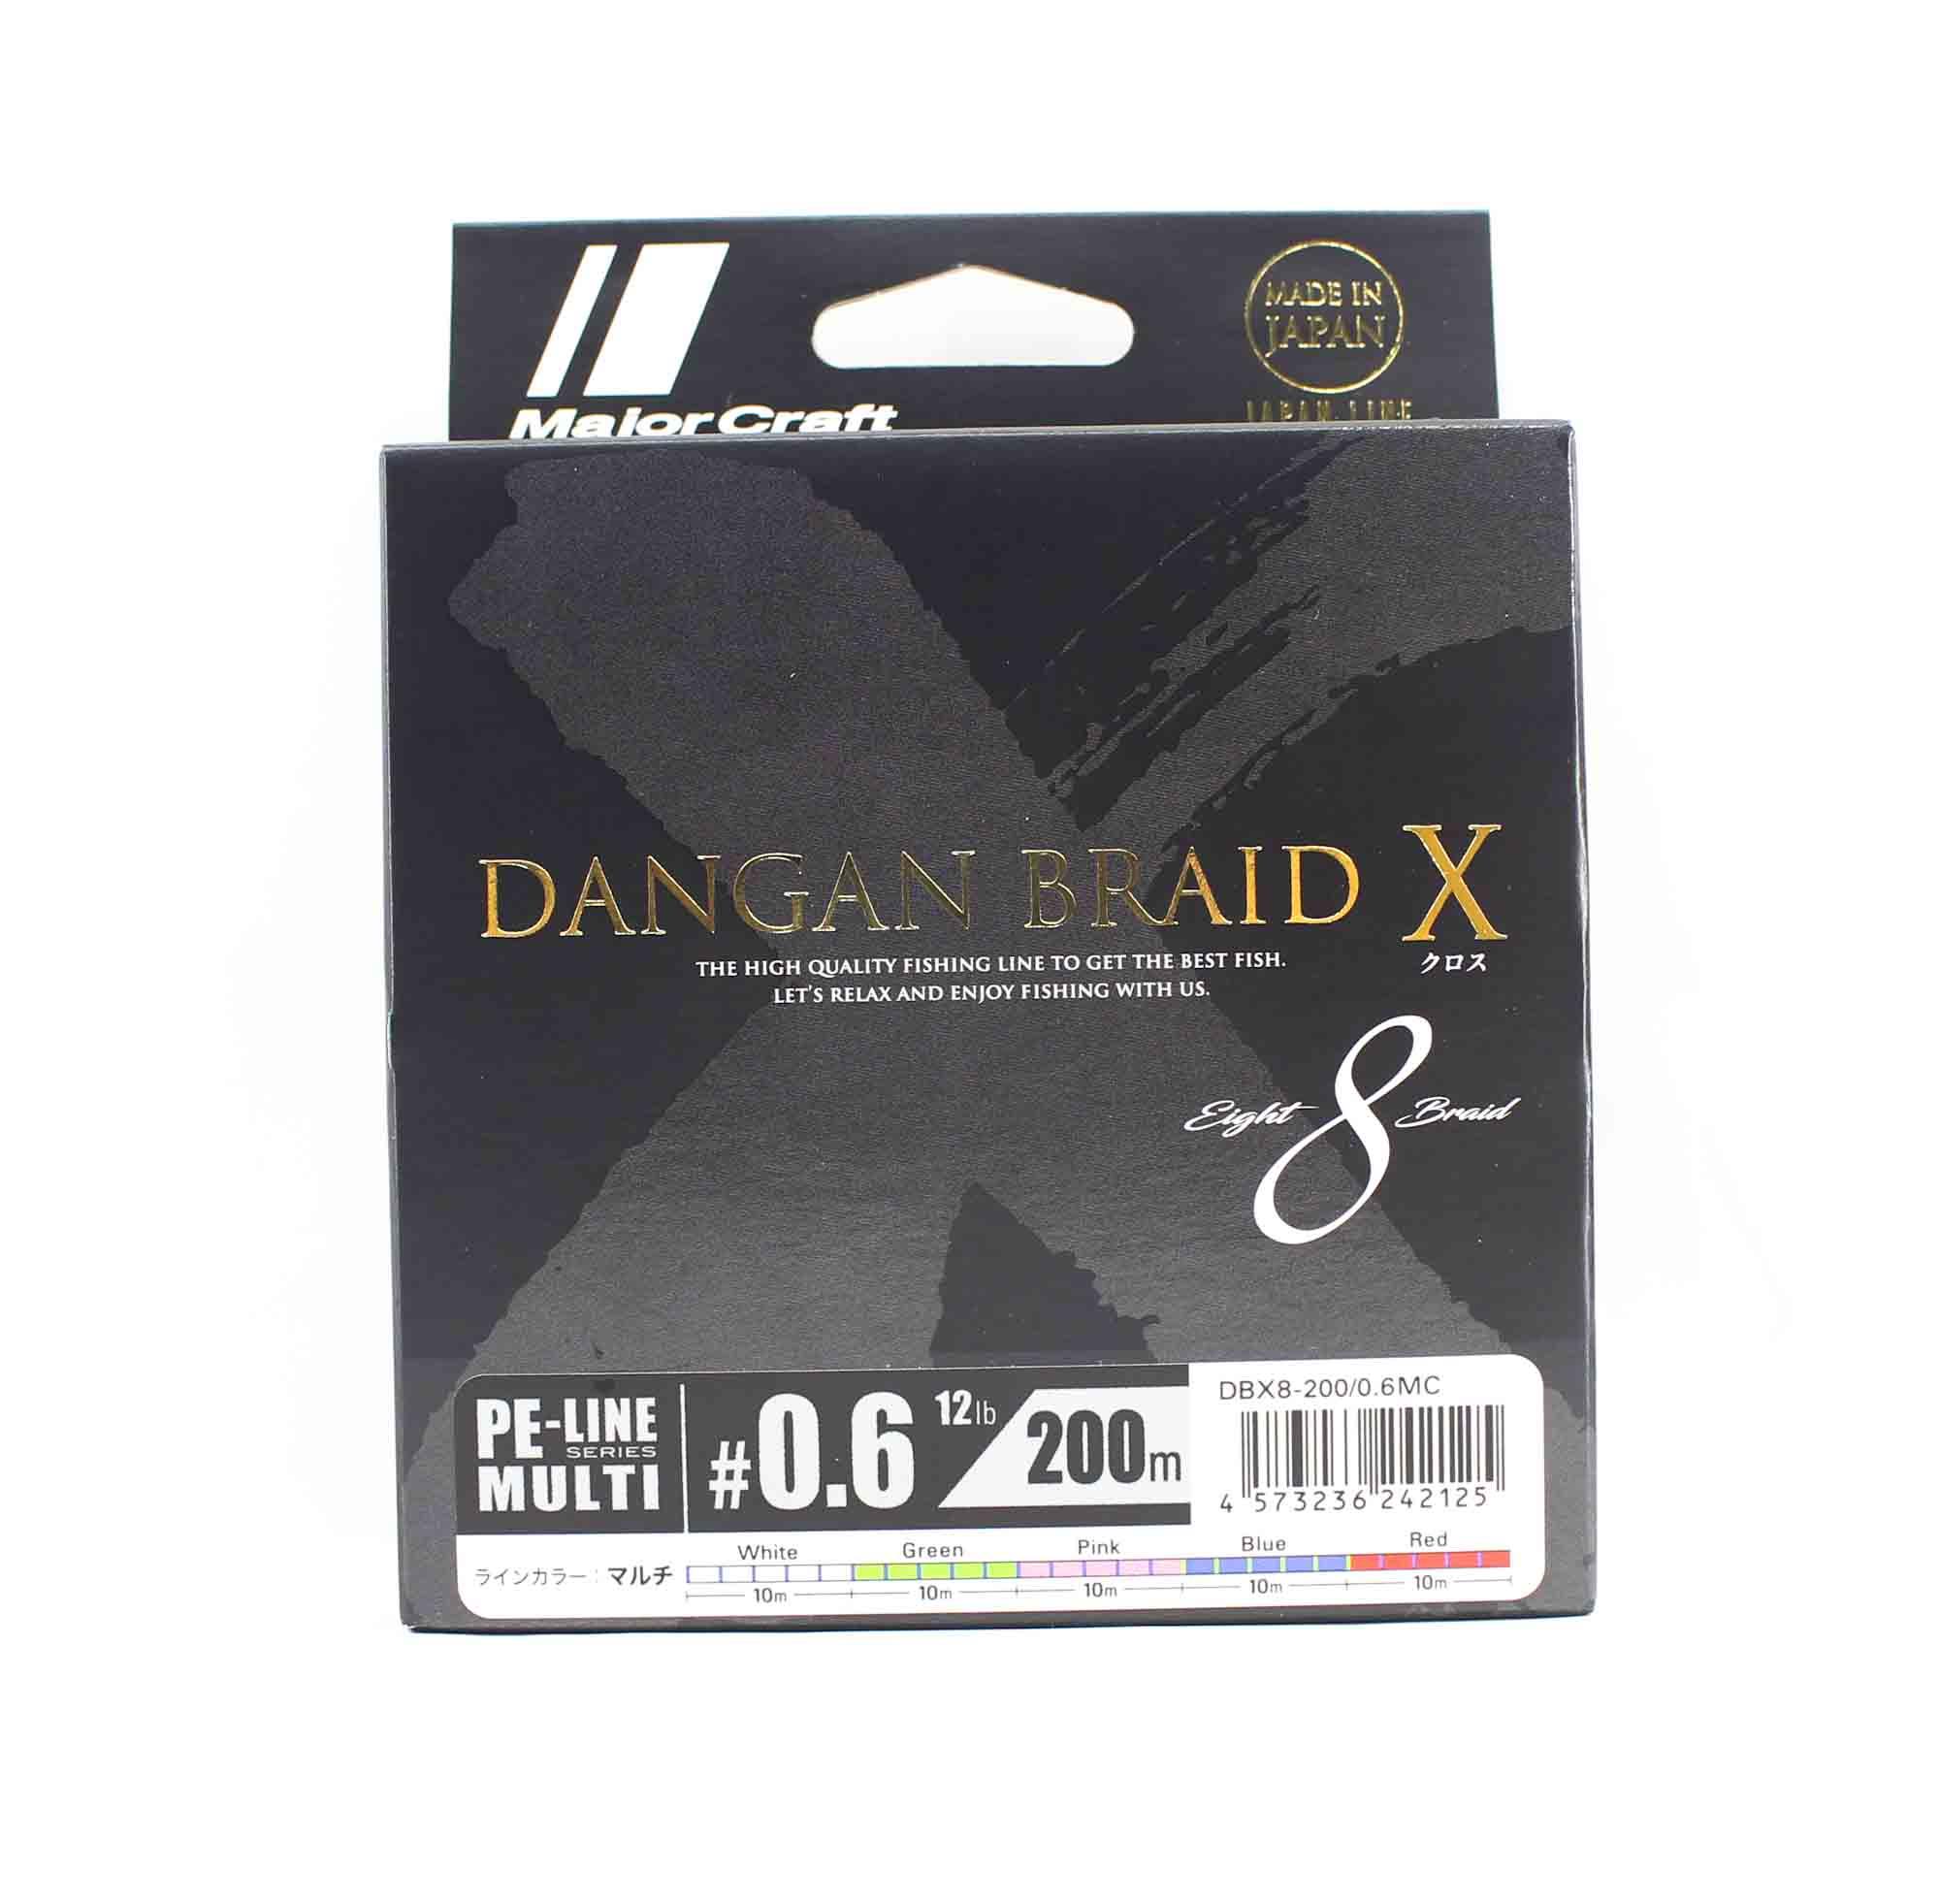 Major Craft Dangan Braid X Line X8 200m P.E 0.6 Multi DBX8-200/0.6MC (2125)